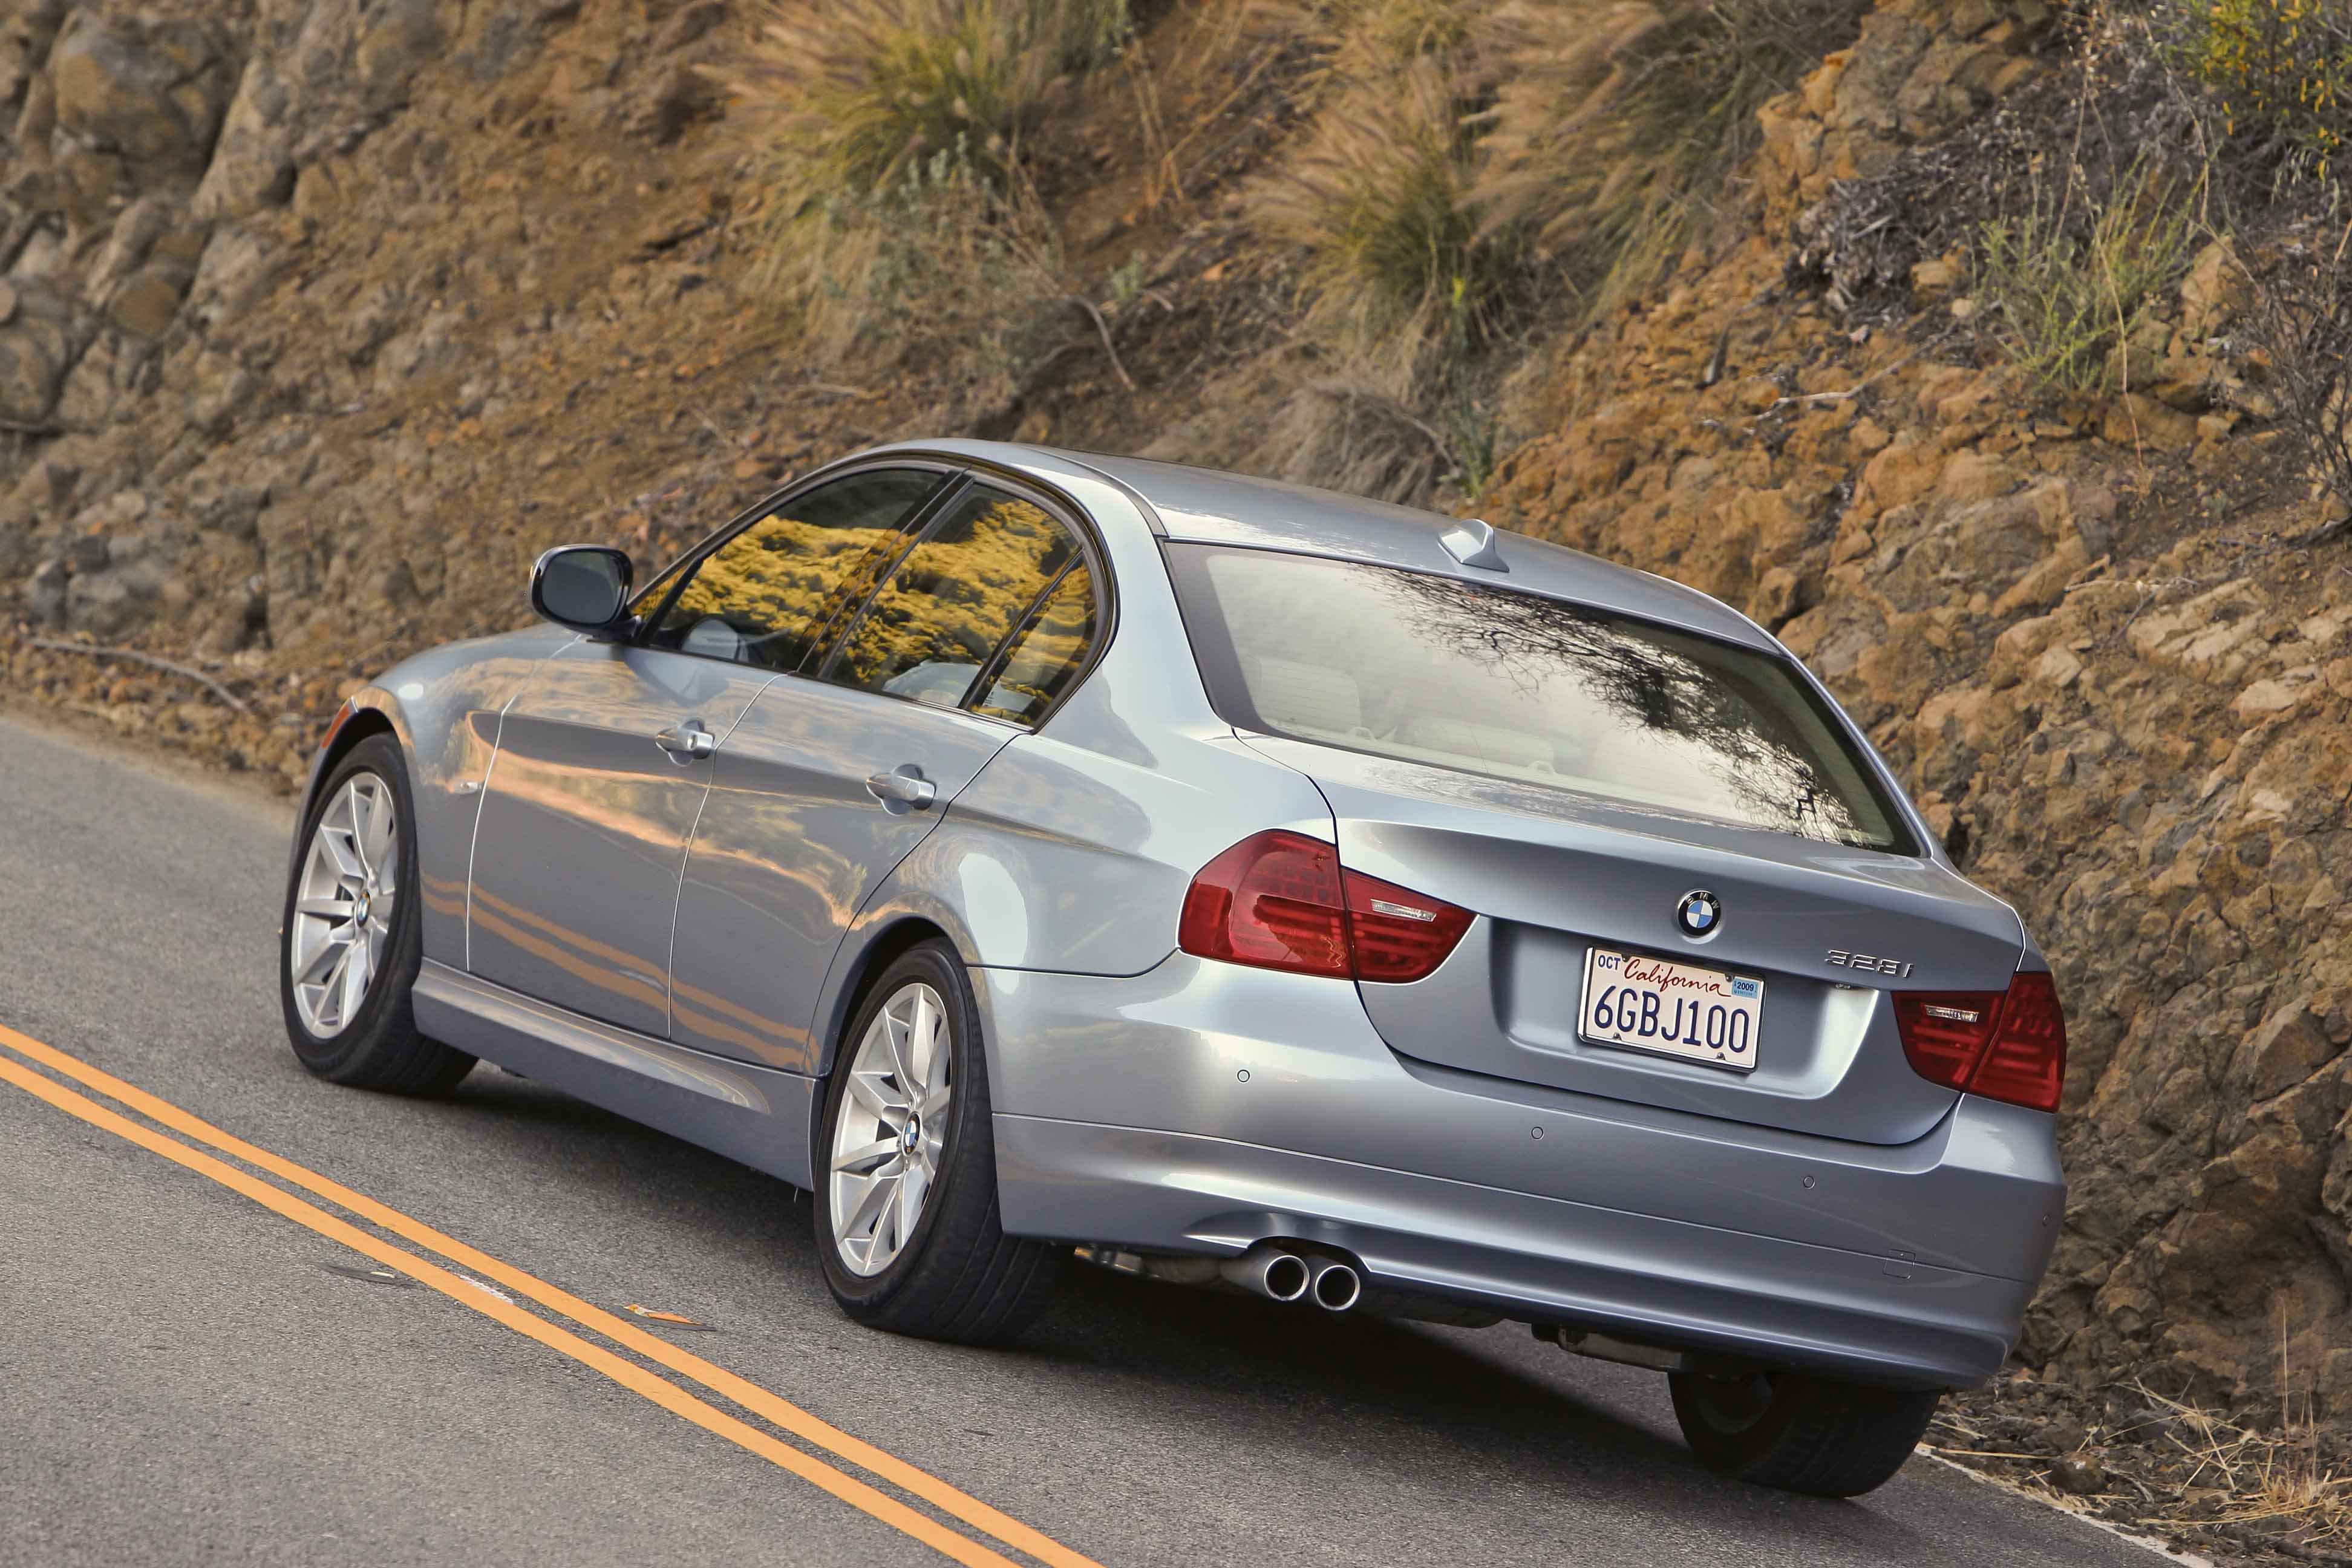 BMW E90/E91/E92/E93 3 Series RWD (2006 to 2013